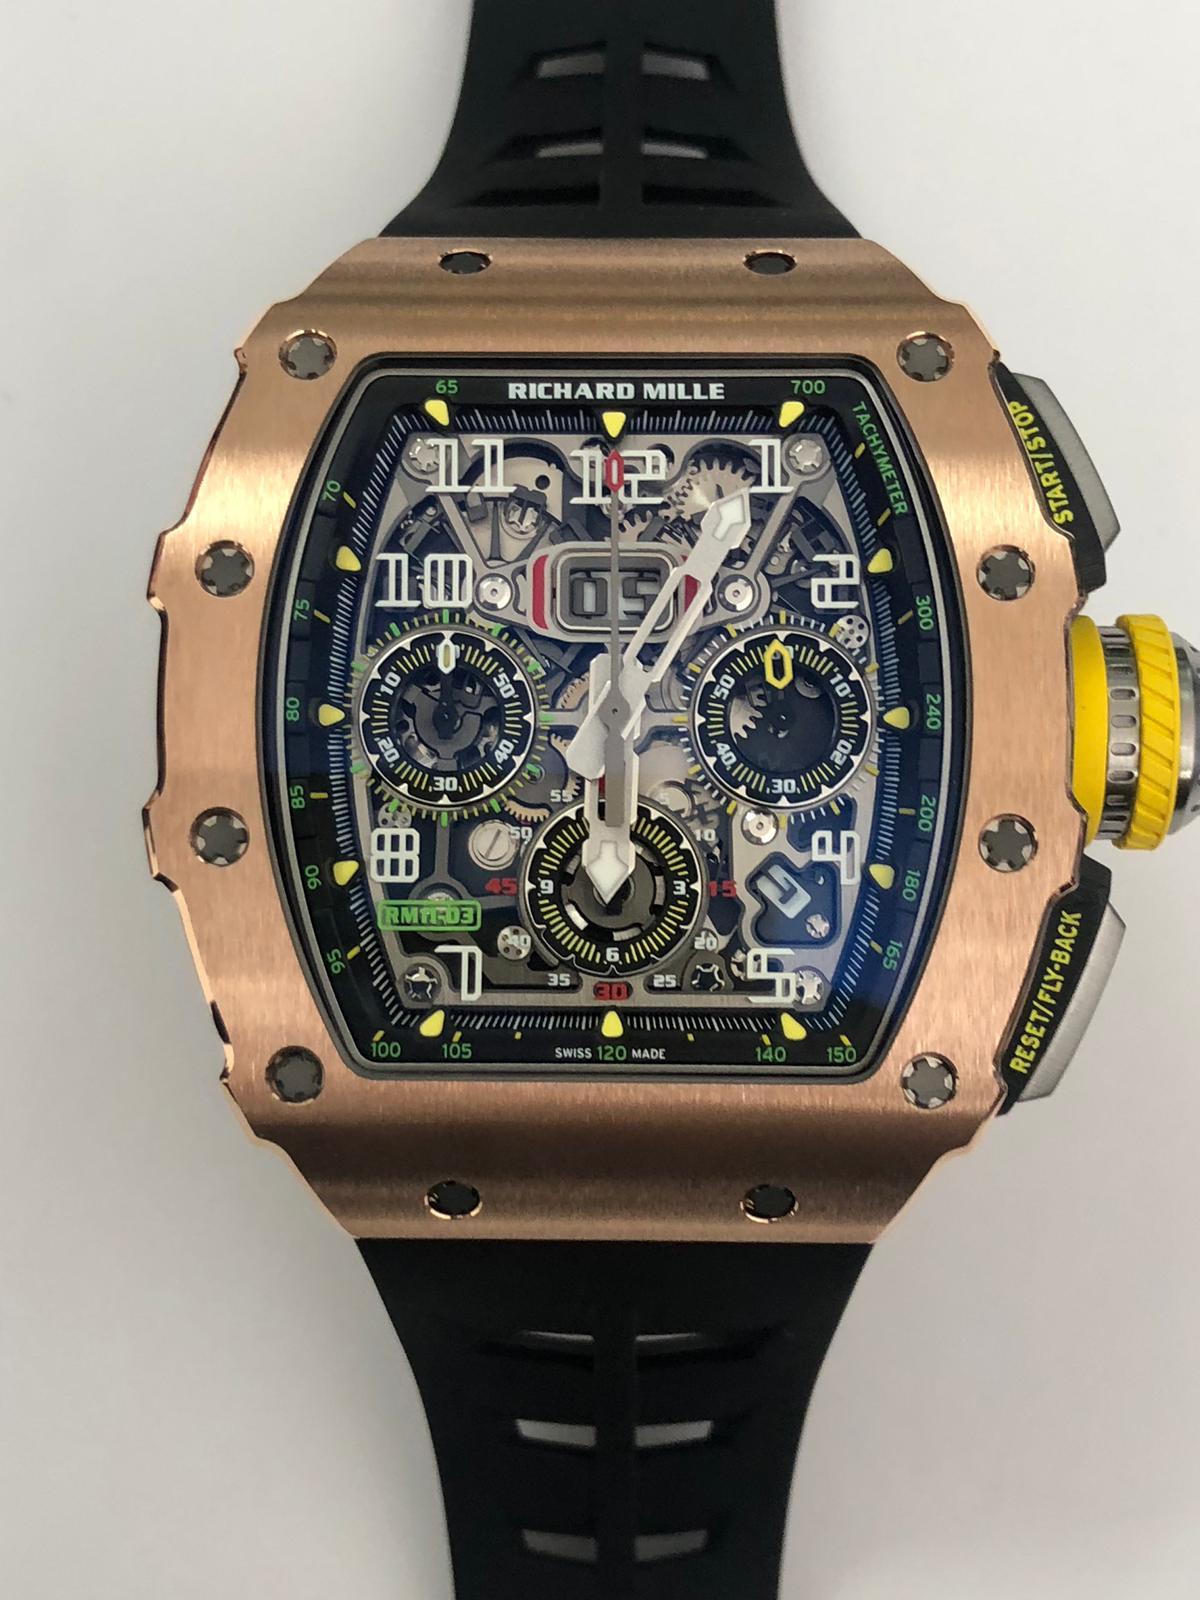 Richard Mille RM 11-03 Rose Gold Titanium Felipe Massa Flyback Chronograph